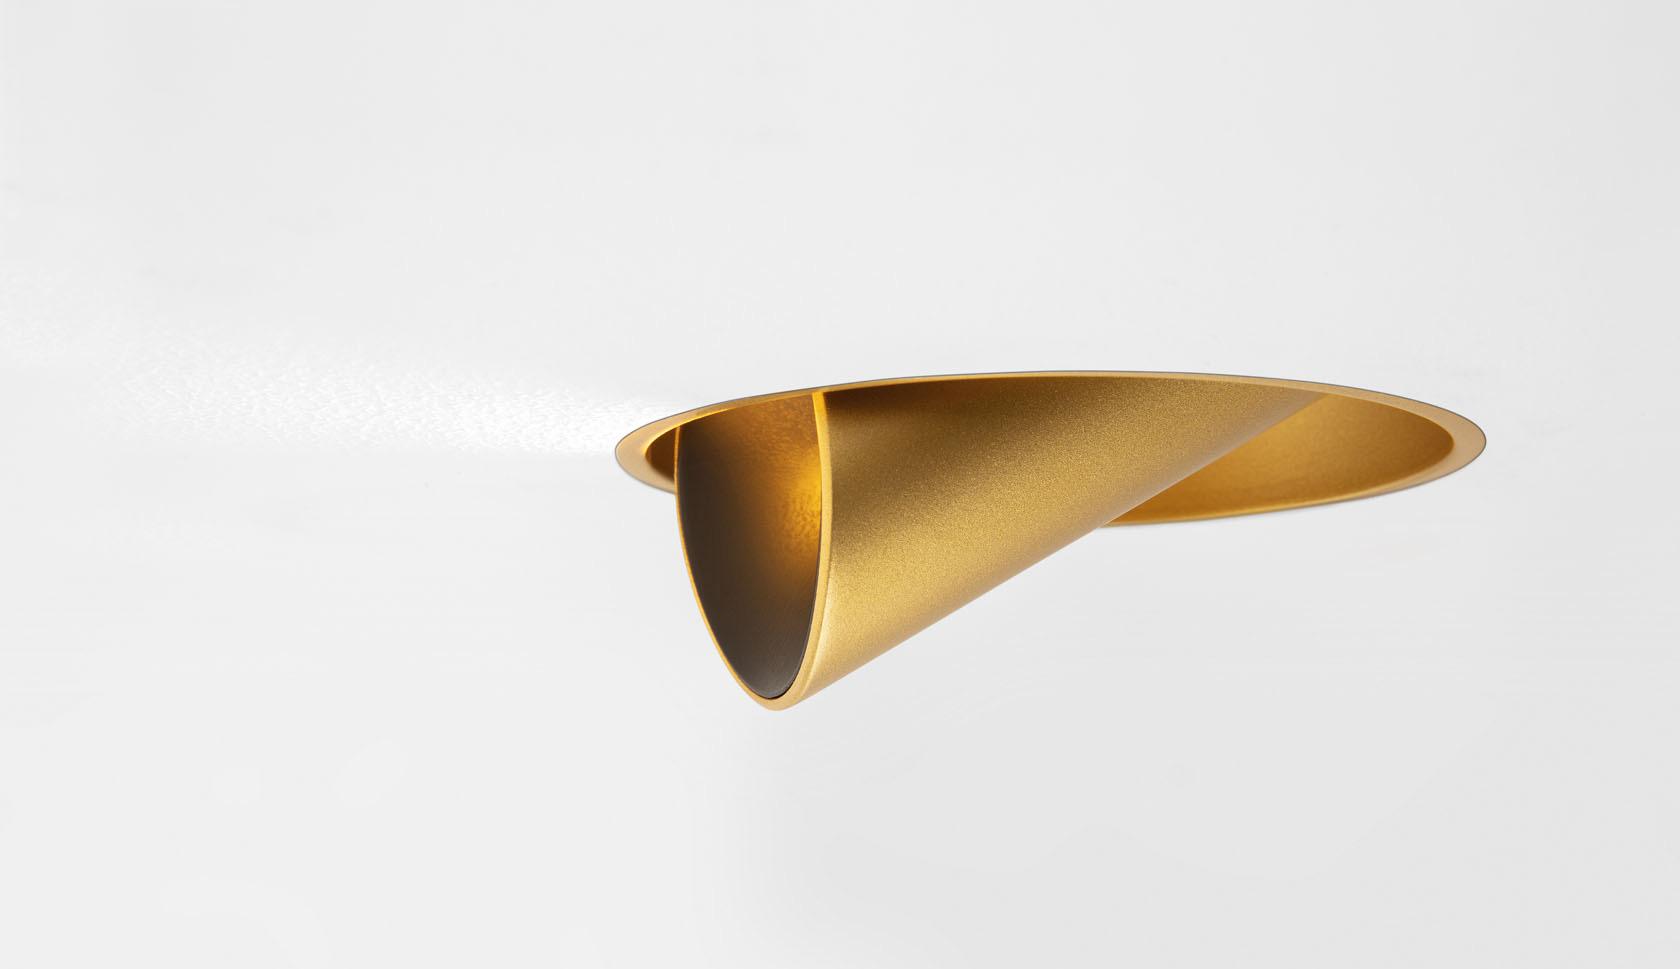 Süvisvalgusti Hollow trimless LED 8.5W 461lm 2700K suunatav h 360° v 90° kuldne